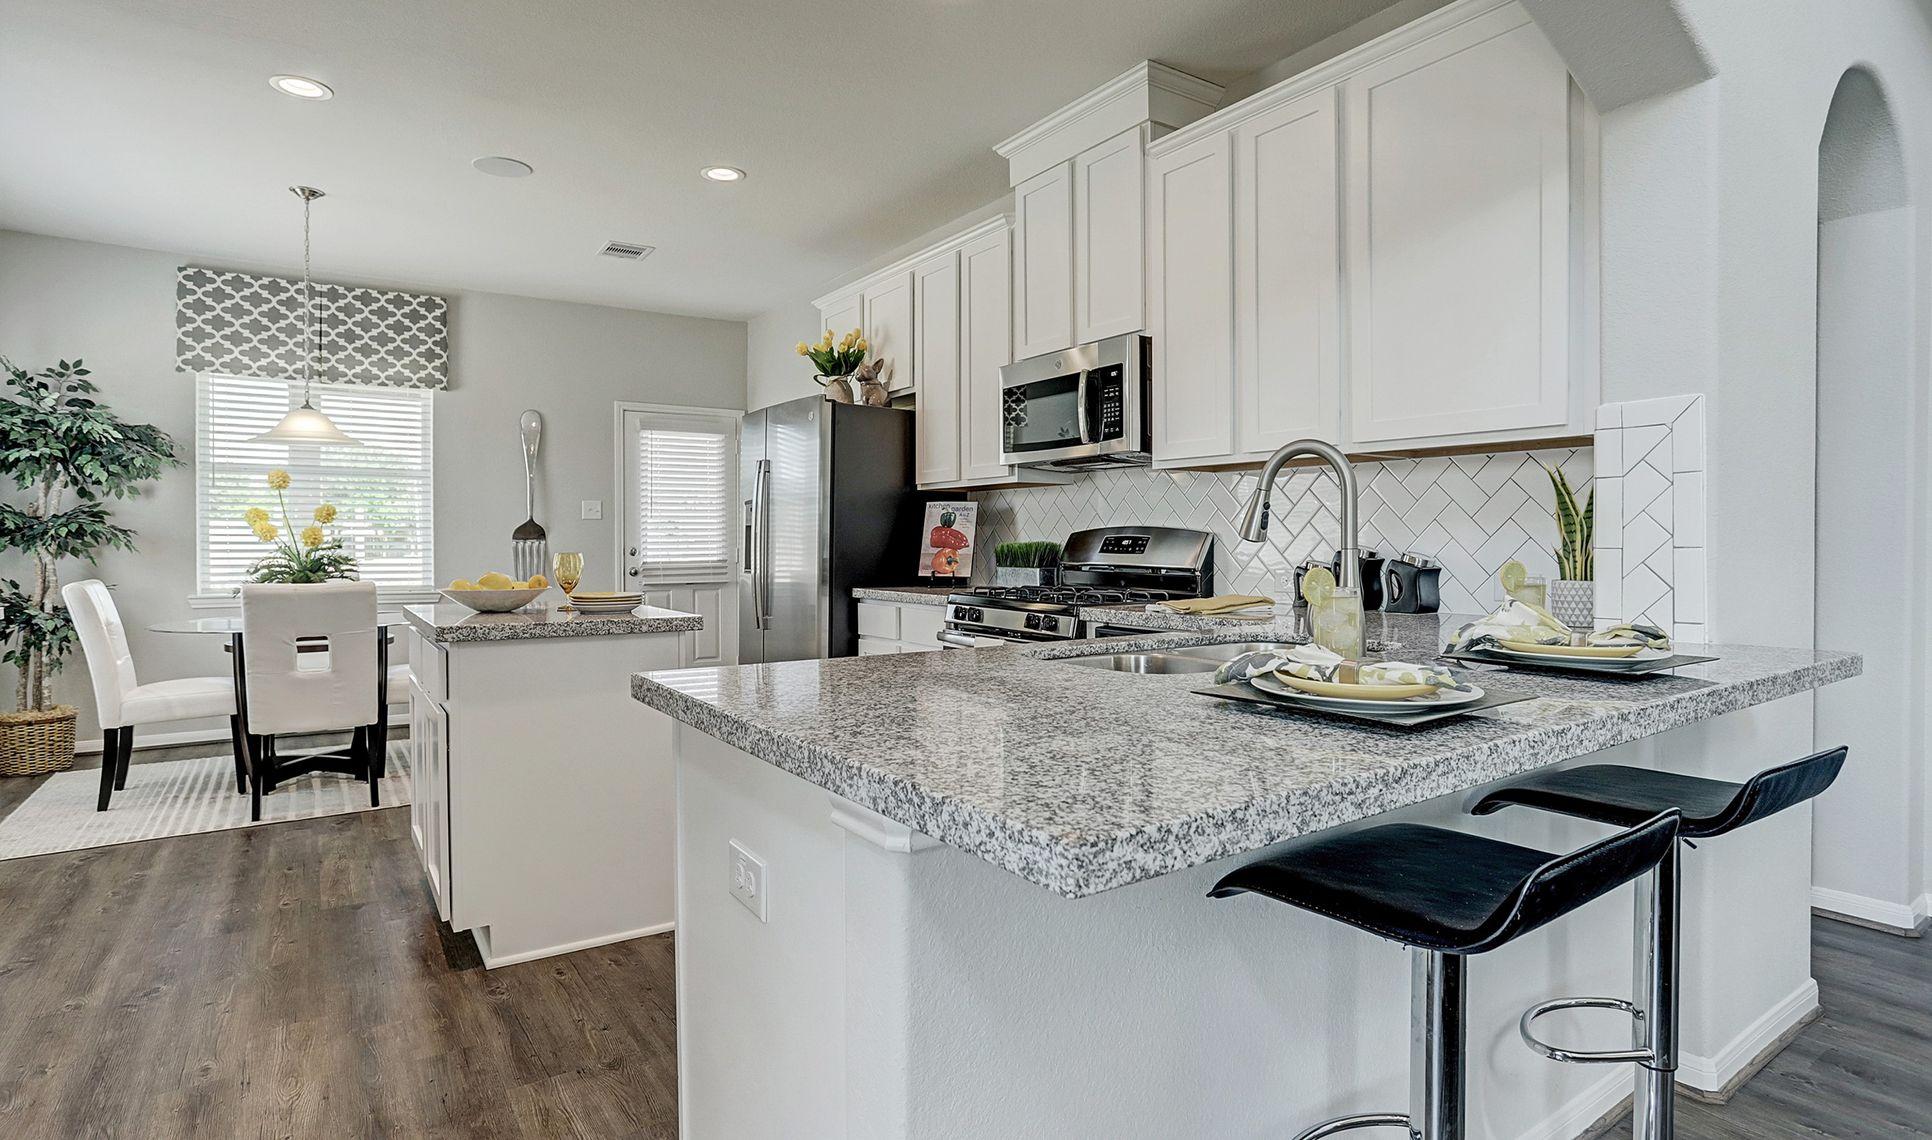 Interior:Lovely kitchen